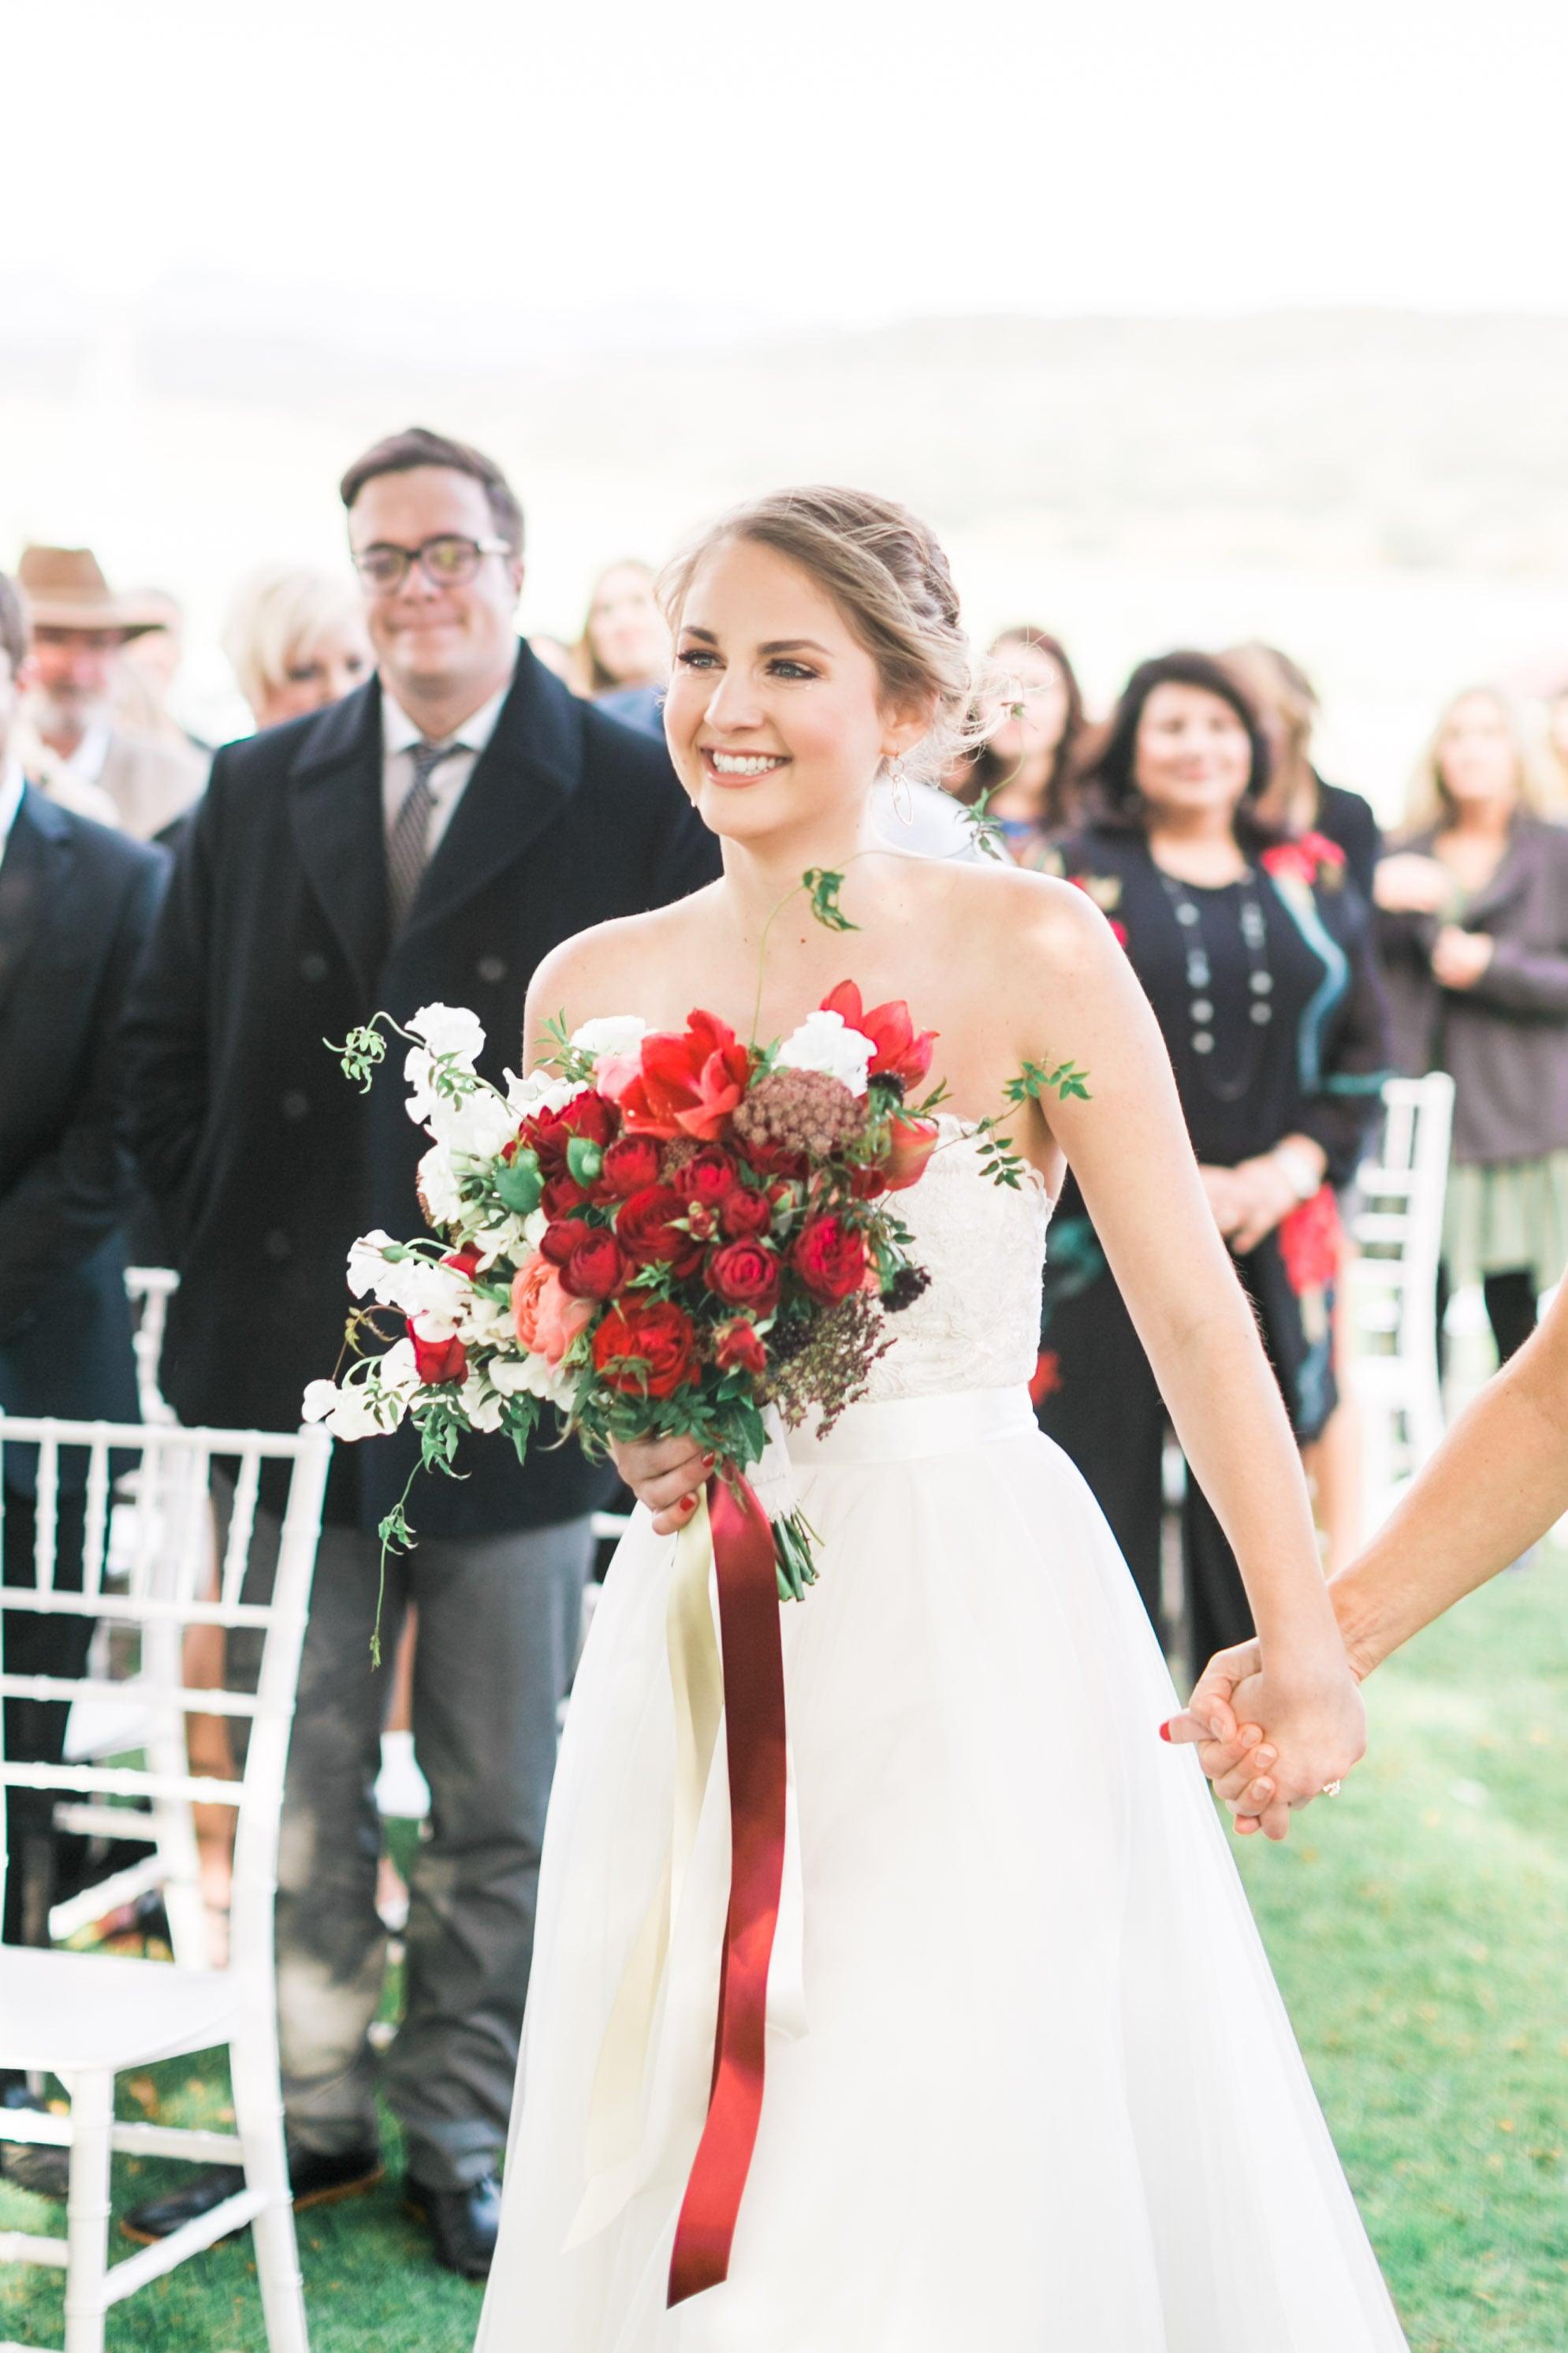 Natalie_Schutt_Photography_Winter_Wedding_San_Luis_Obispo-103.jpg